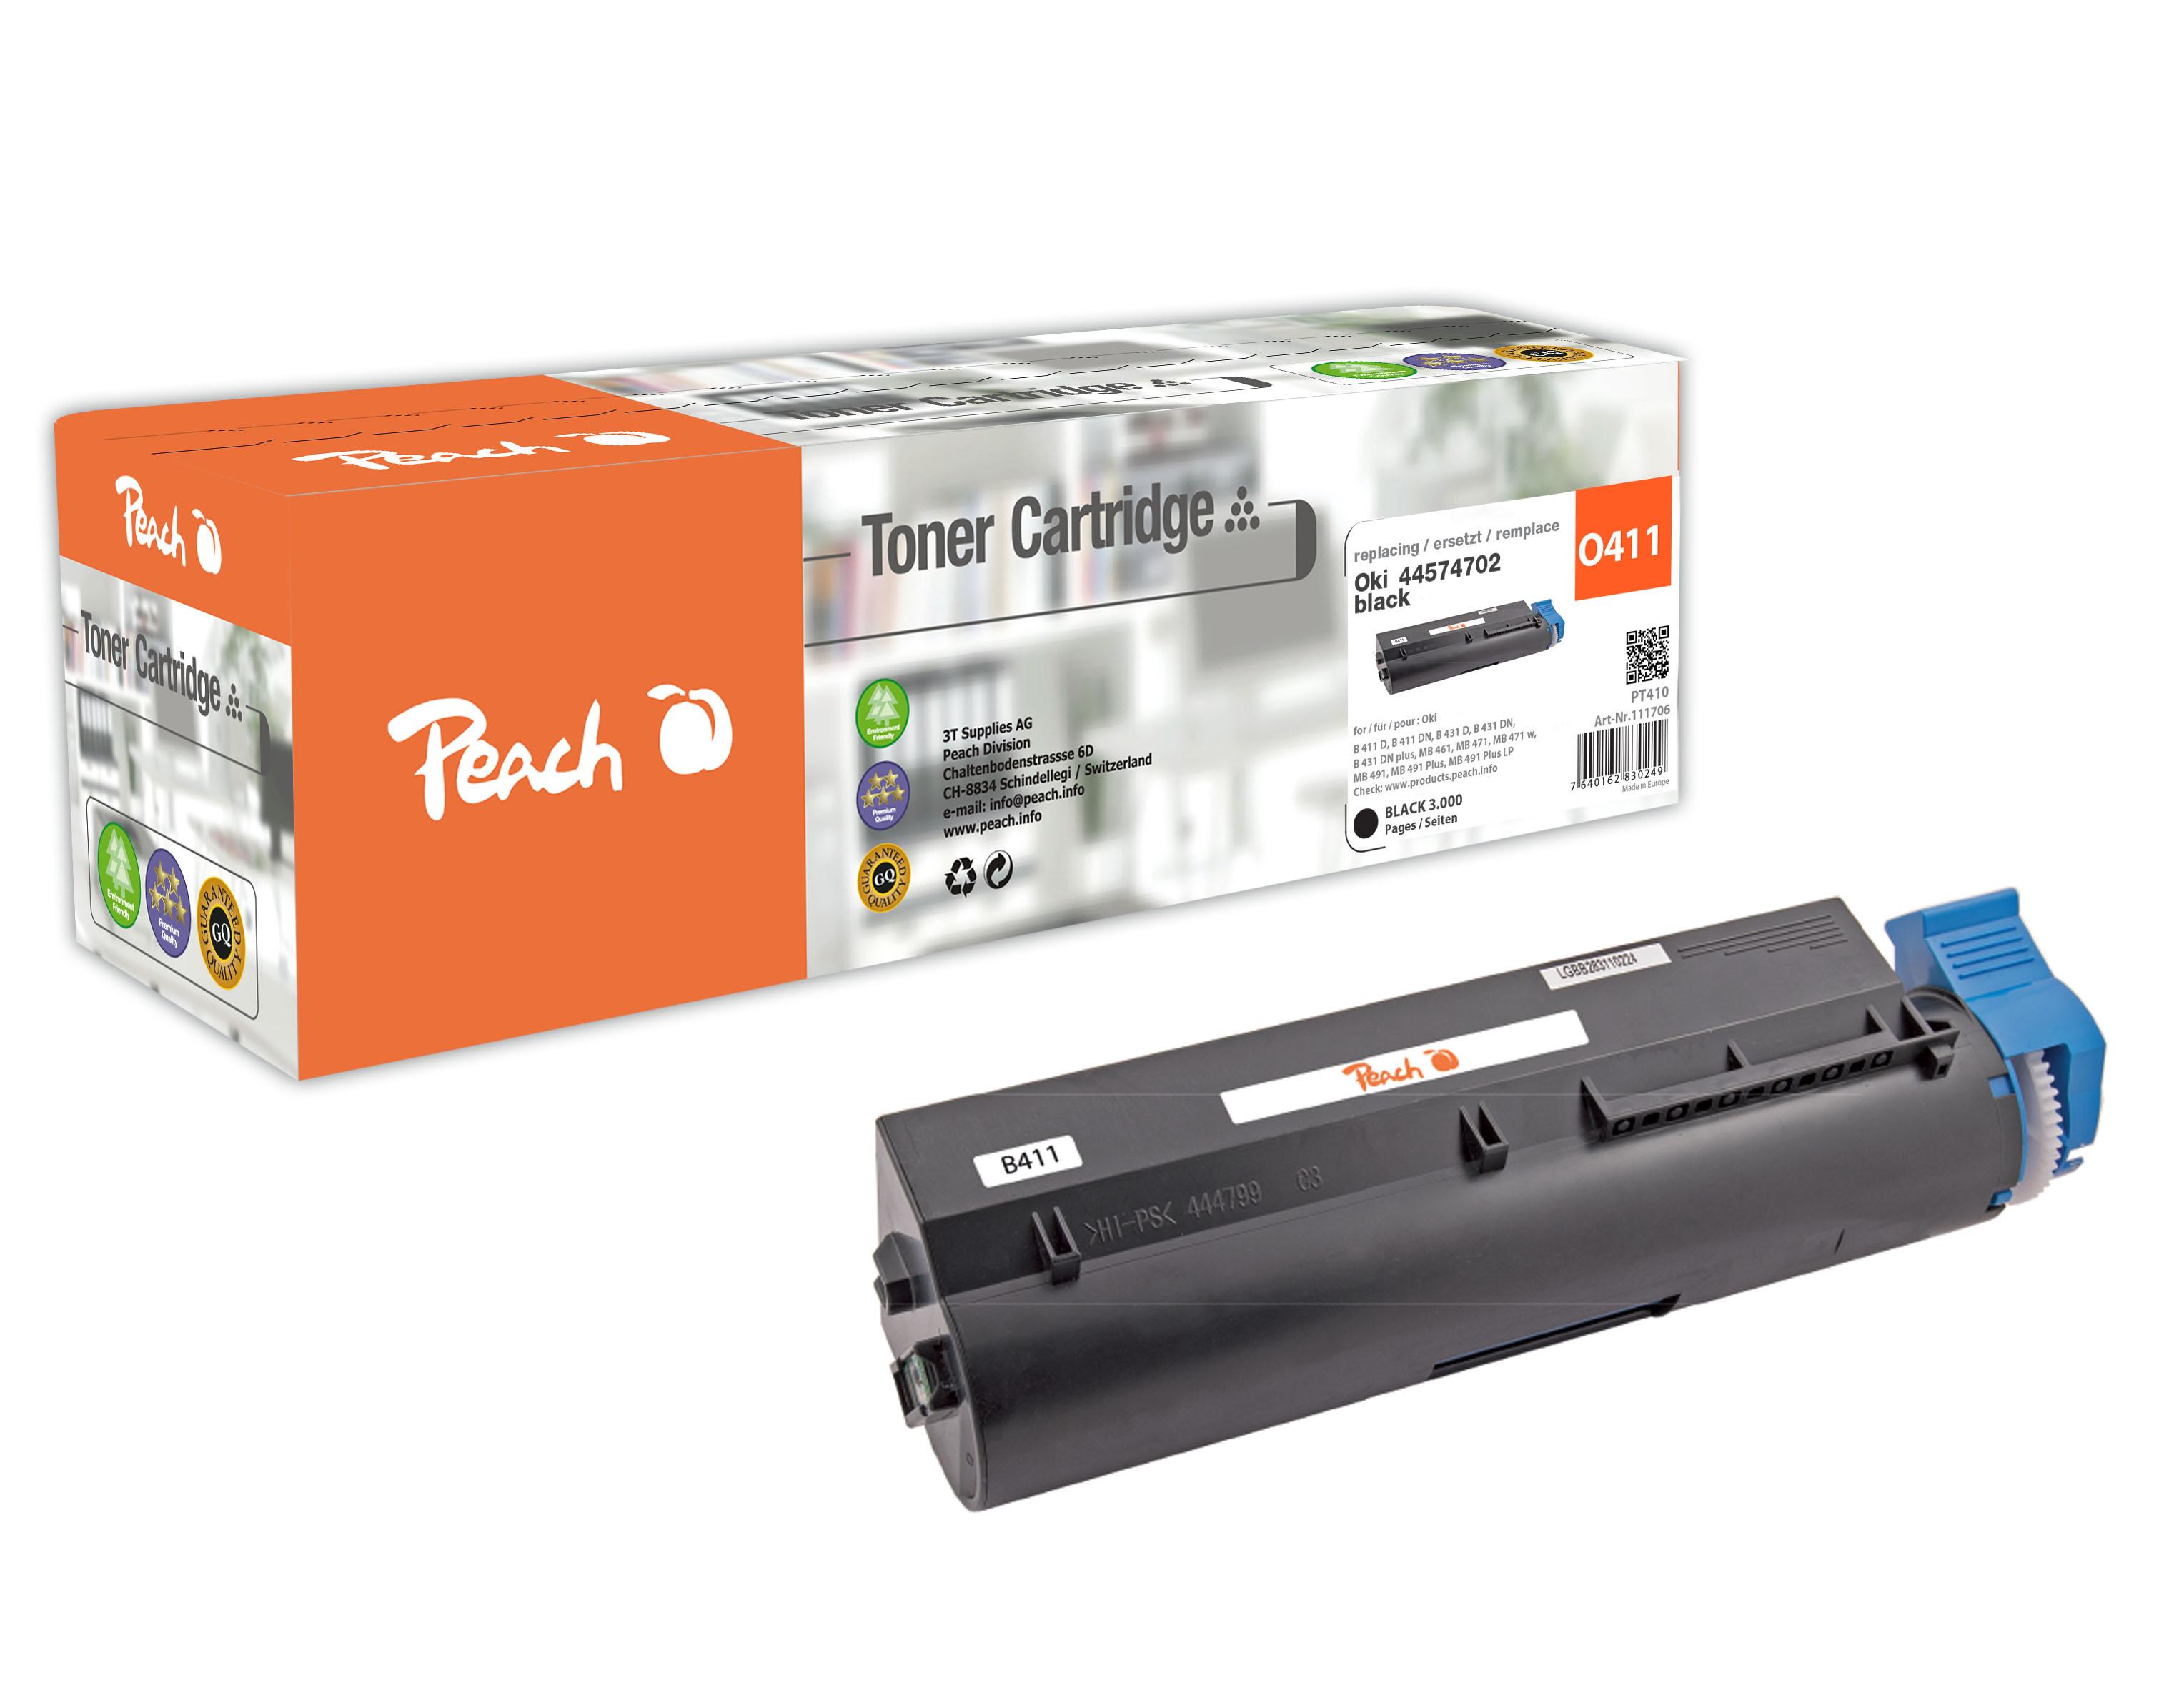 peach toner module noire compatible avecid fabricant. Black Bedroom Furniture Sets. Home Design Ideas